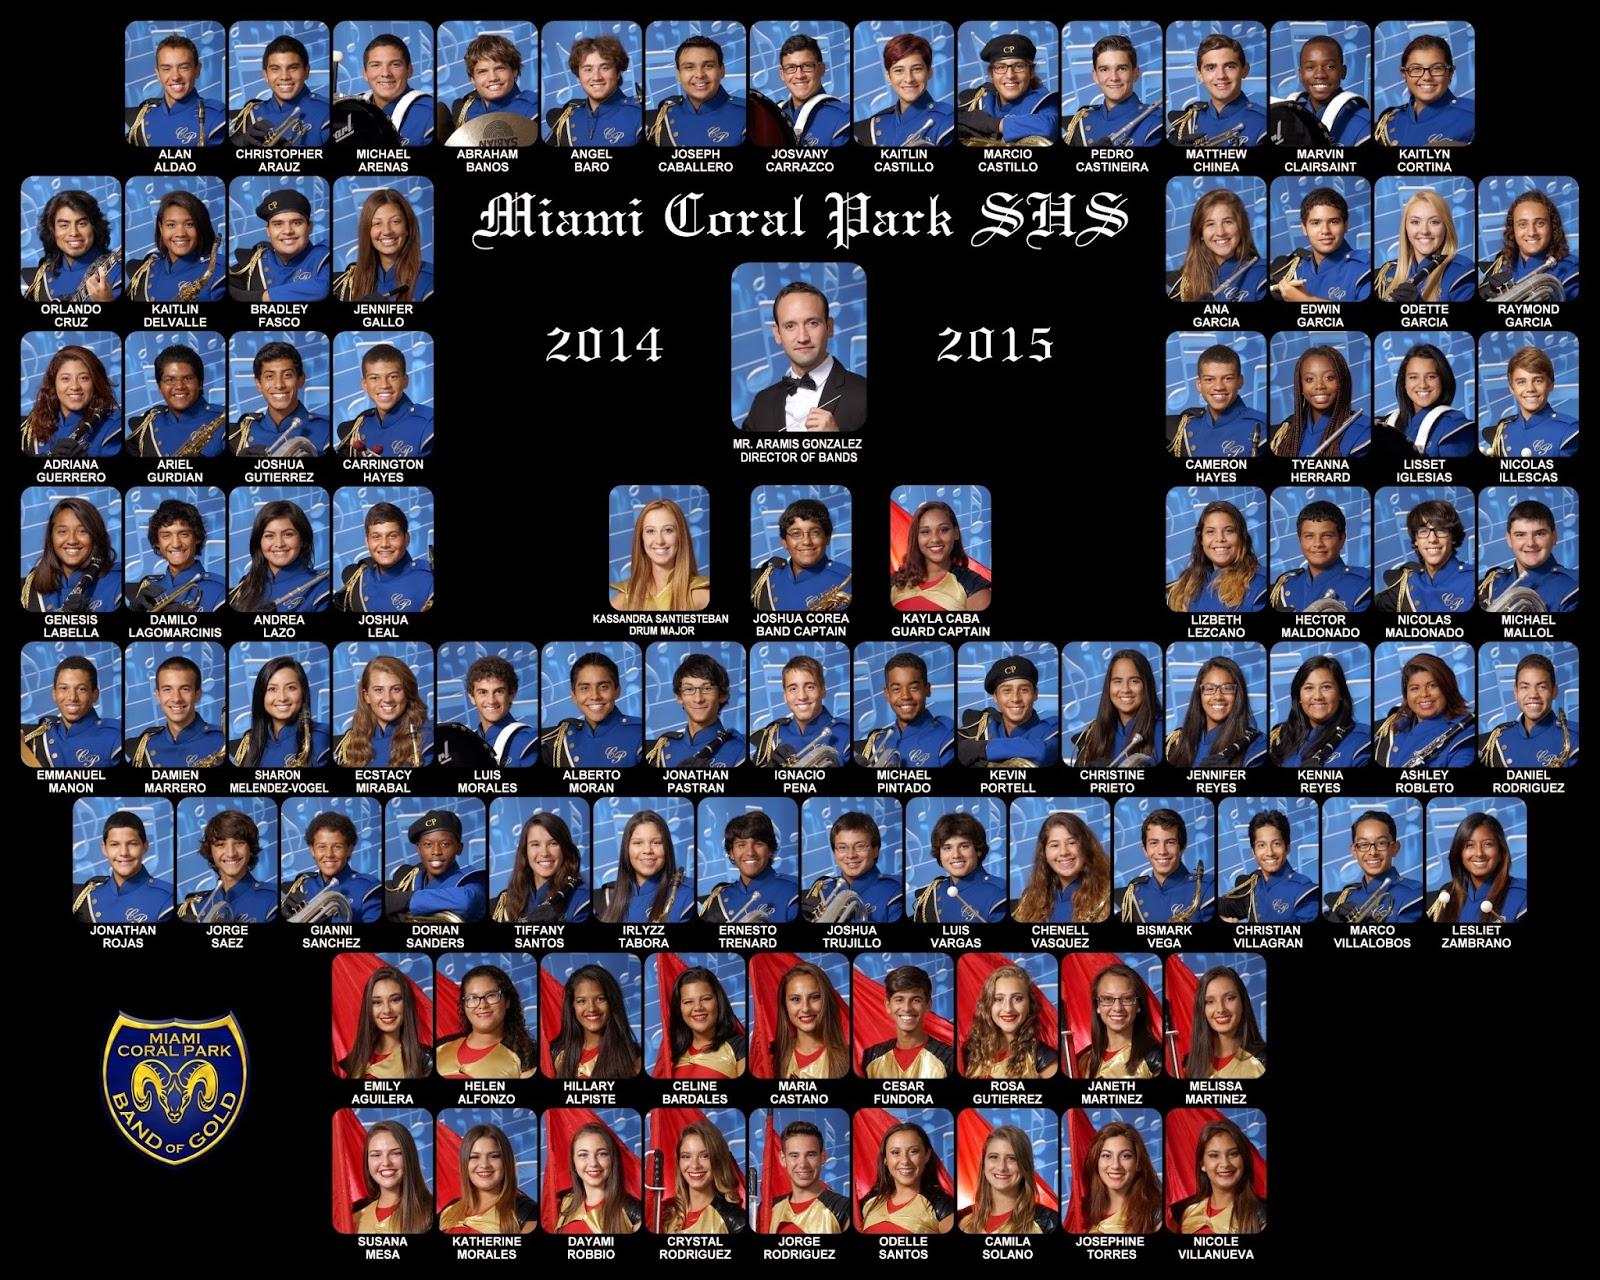 Park Miami Miami Coral Park Shs 2014-2015